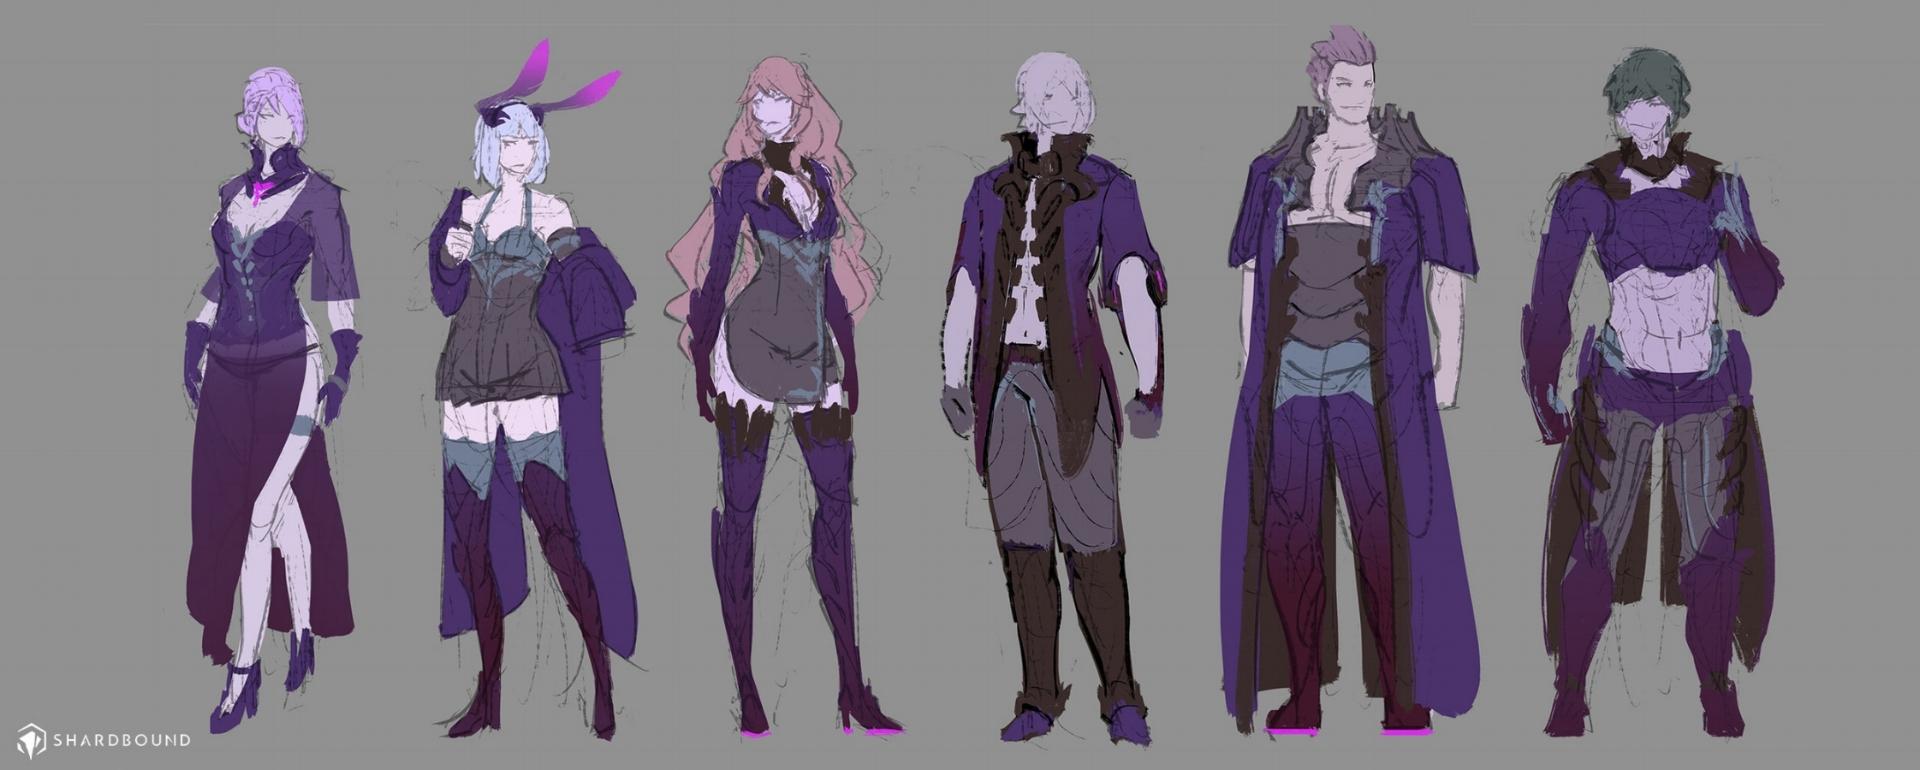 PurpleFaction_VizDev_Clothing1.jpg